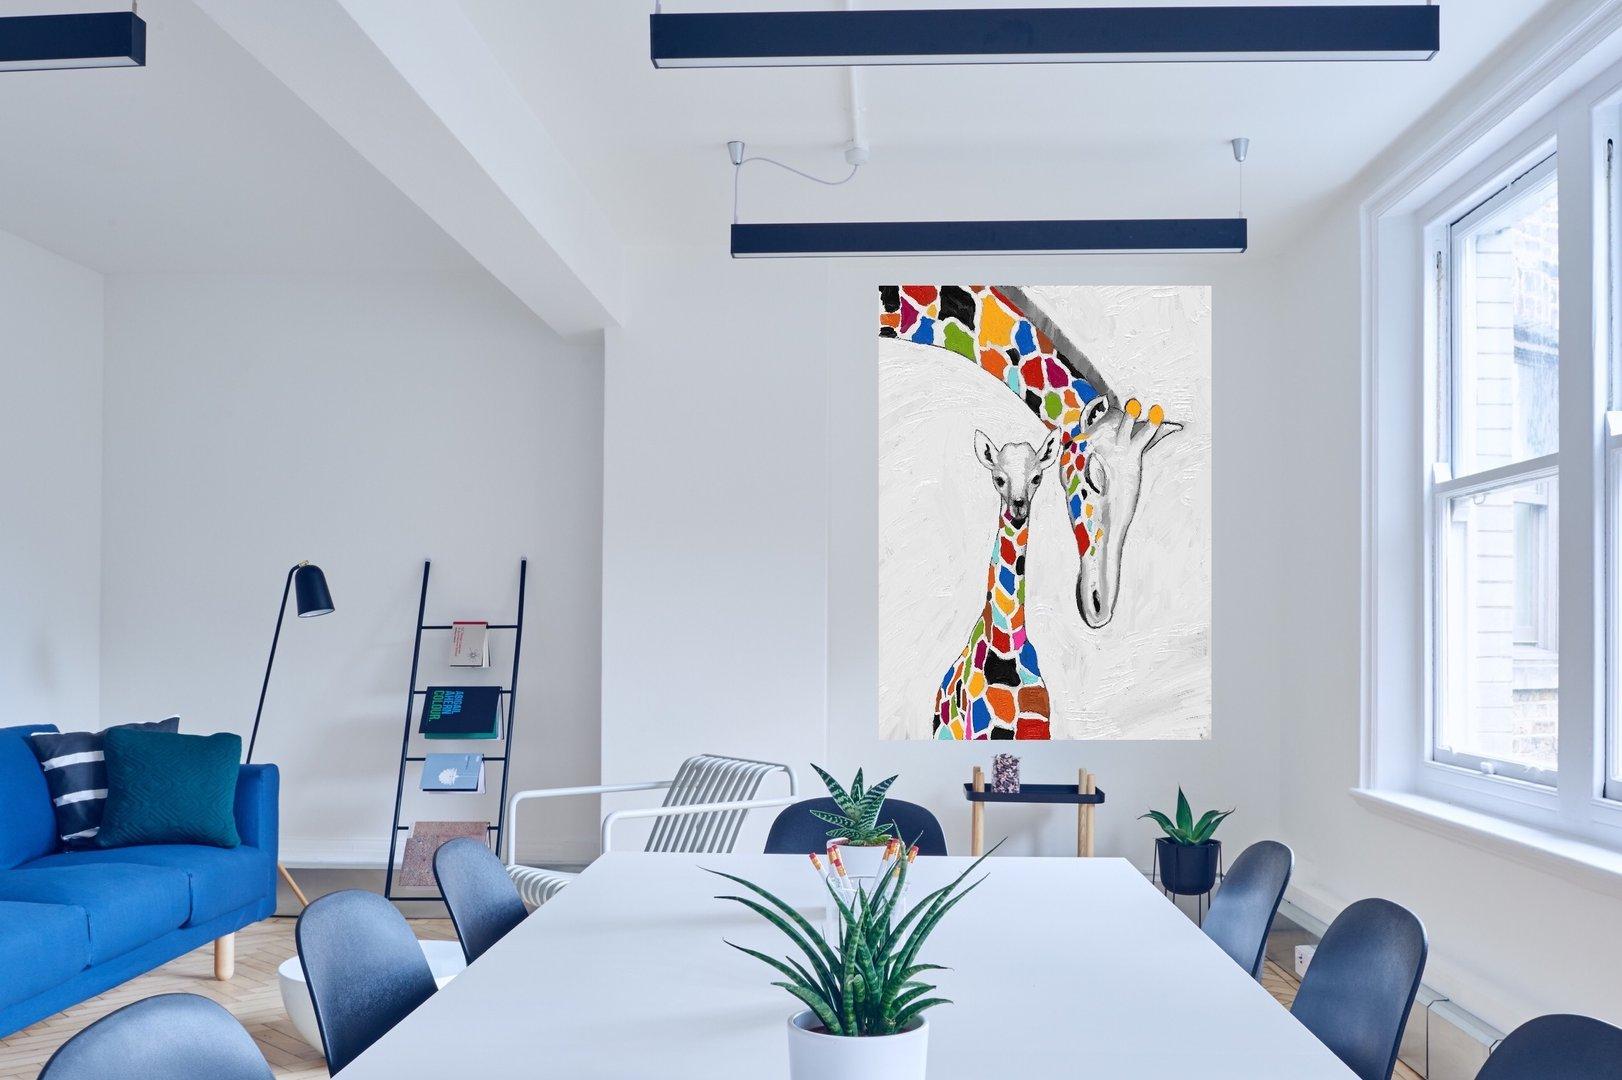 Cuadro moderno tnico jirafas pintado tienda de cuadros - Cuadros modernos ...